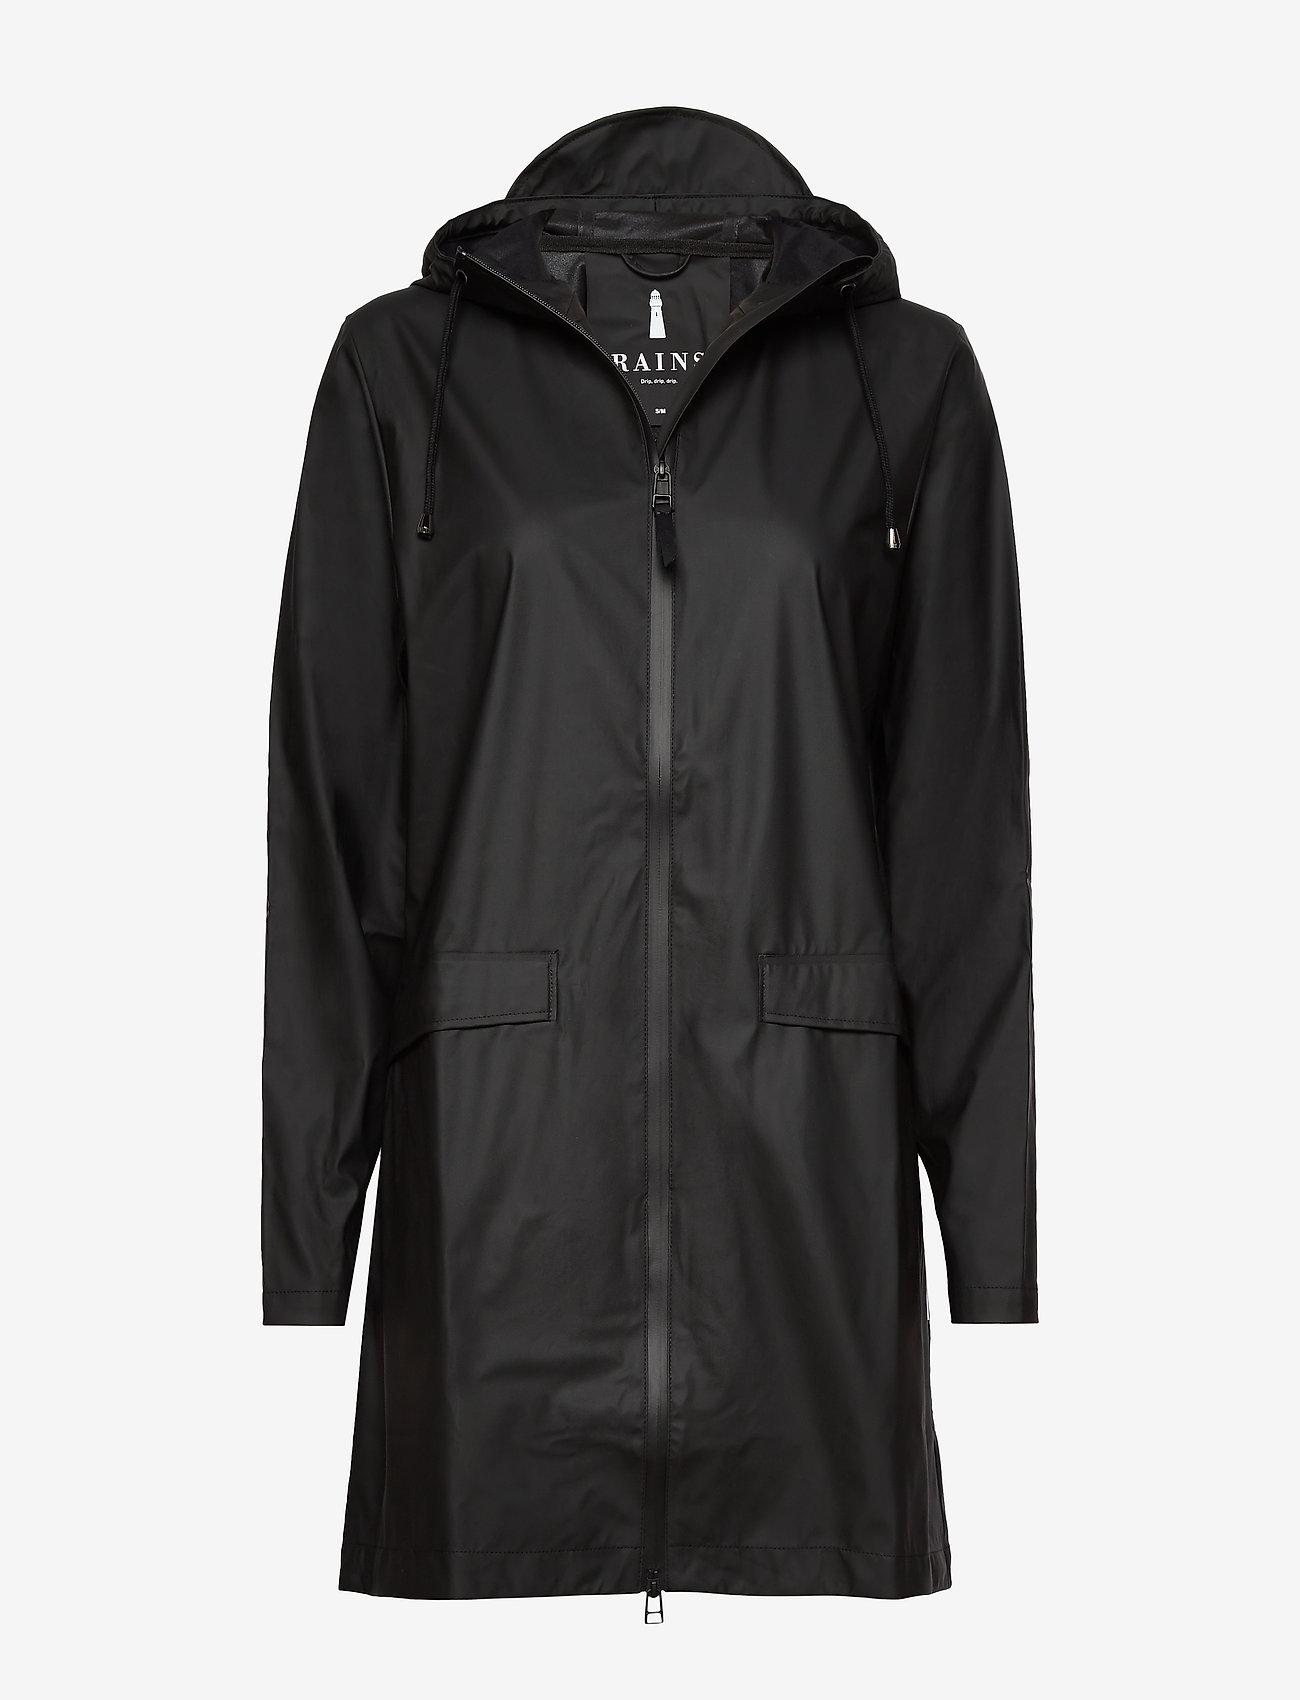 Rains - W Coat - regenbekleidung - 01 black - 1